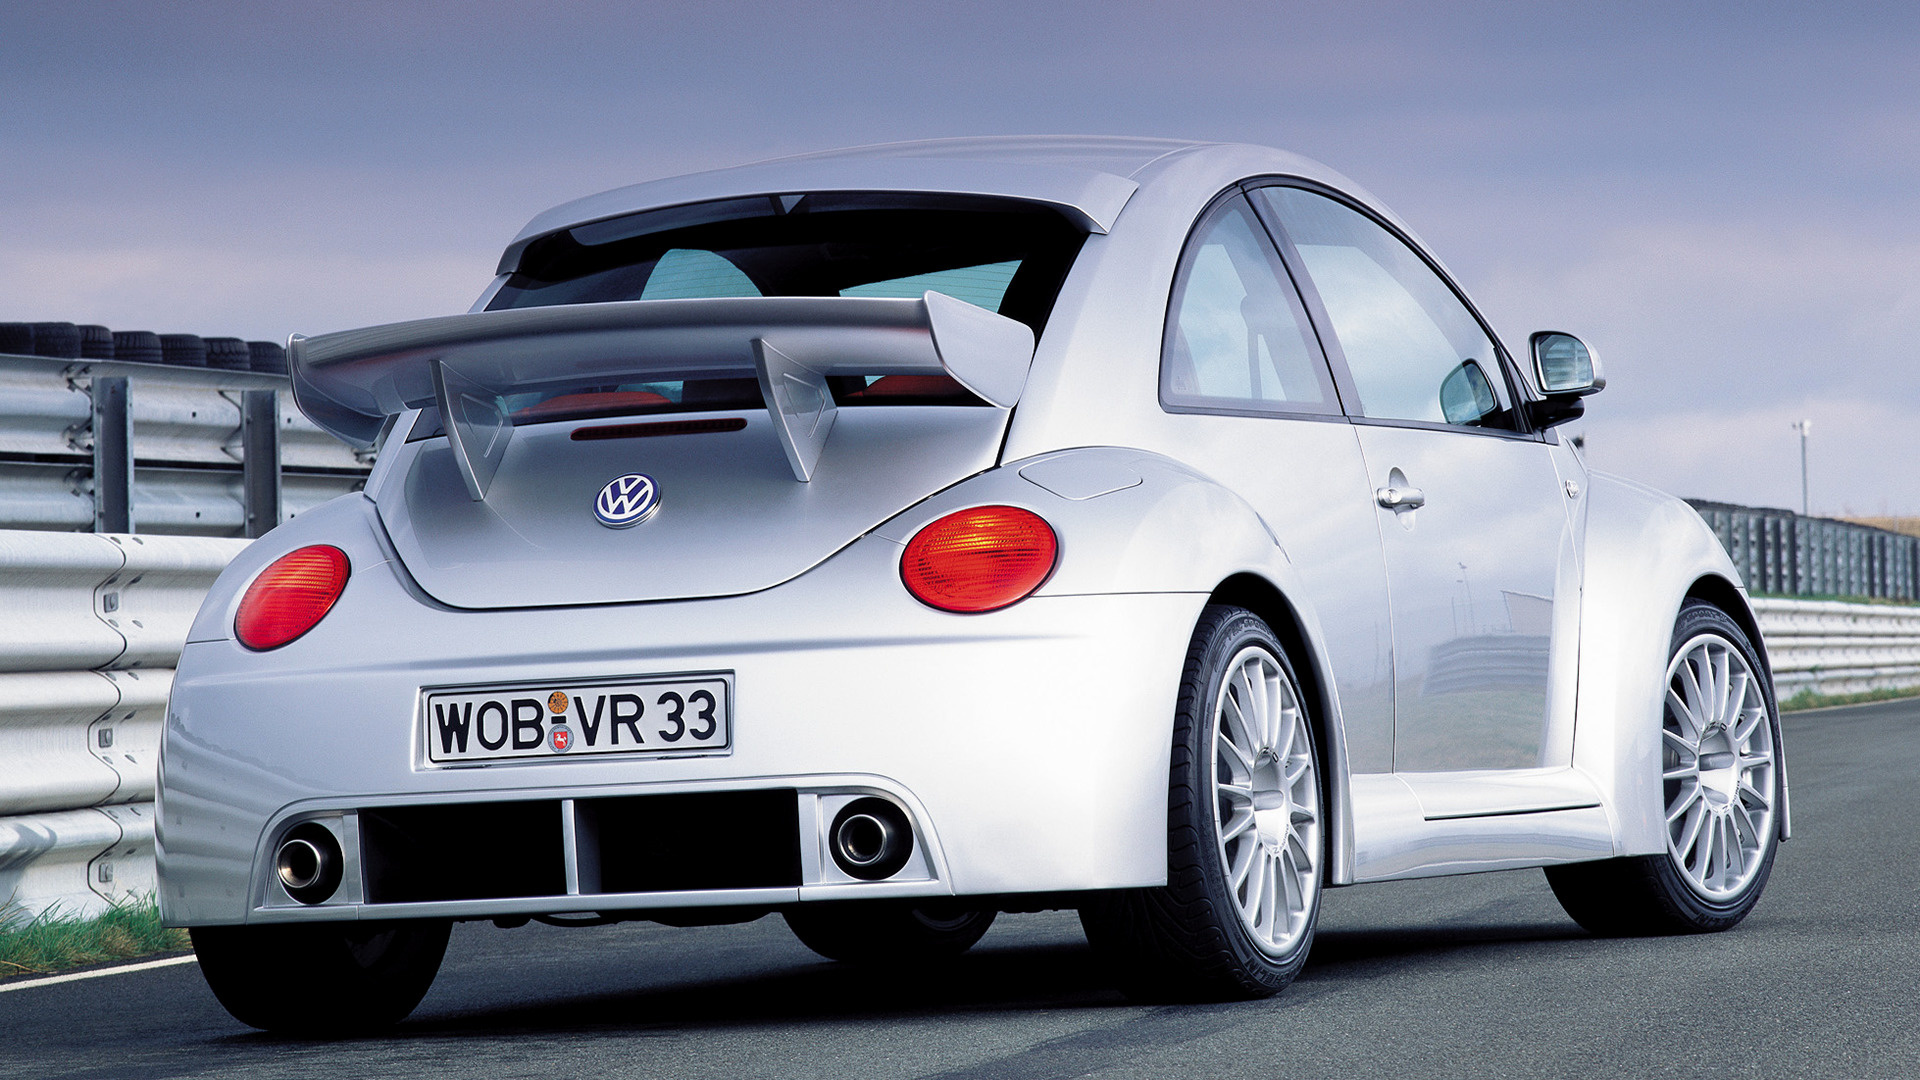 volkswagen new beetle rsi 2001 wallpapers and hd images car pixel. Black Bedroom Furniture Sets. Home Design Ideas